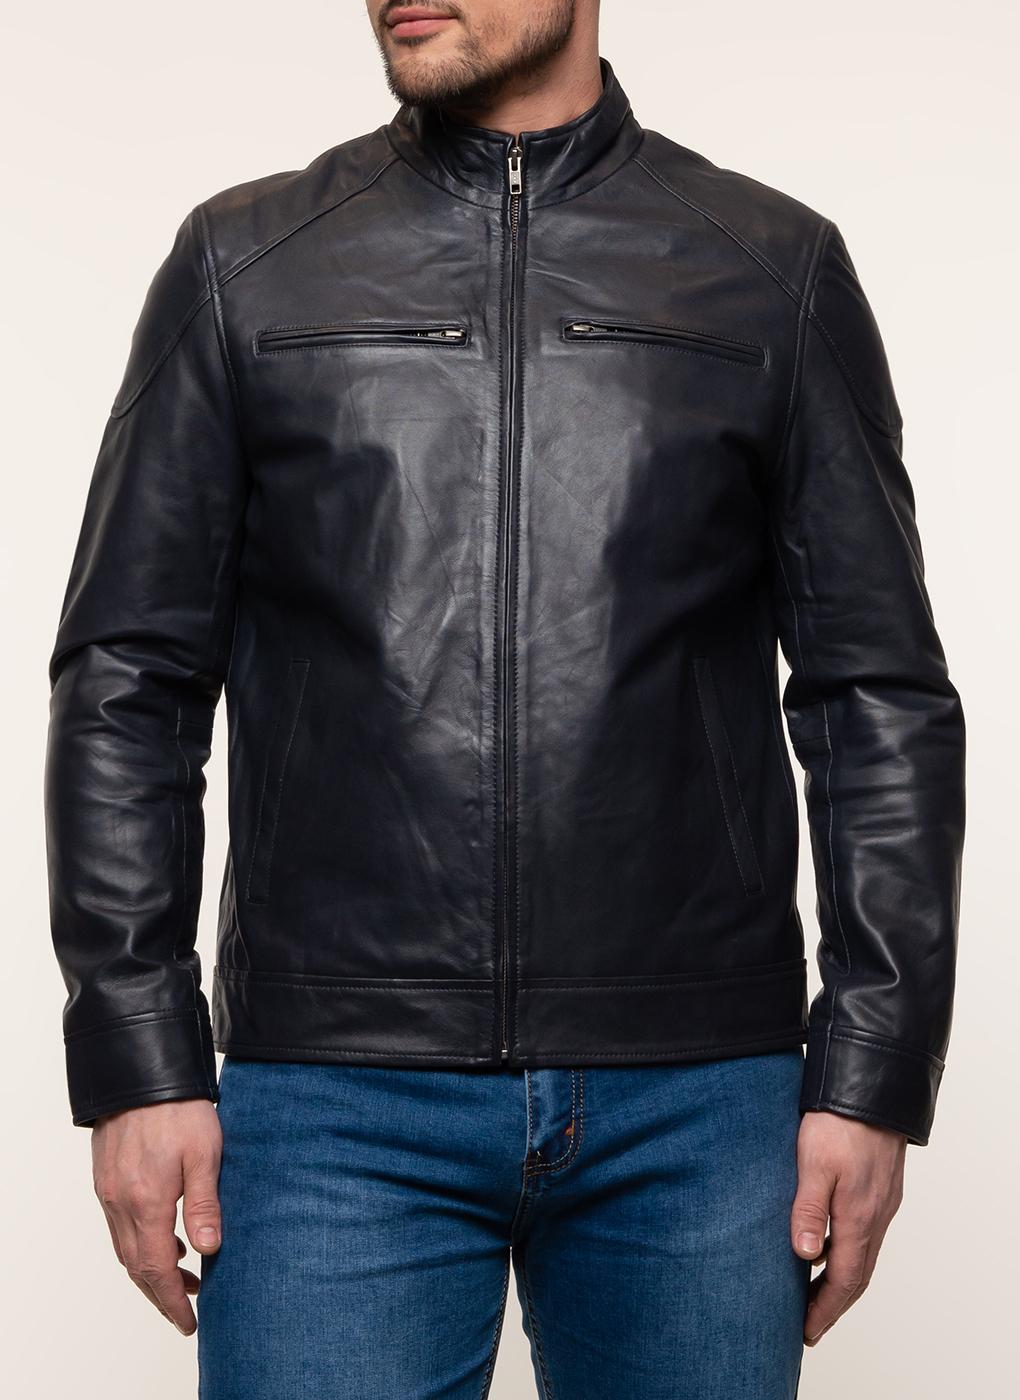 Кожаная куртка мужская 16, Gotthold фото